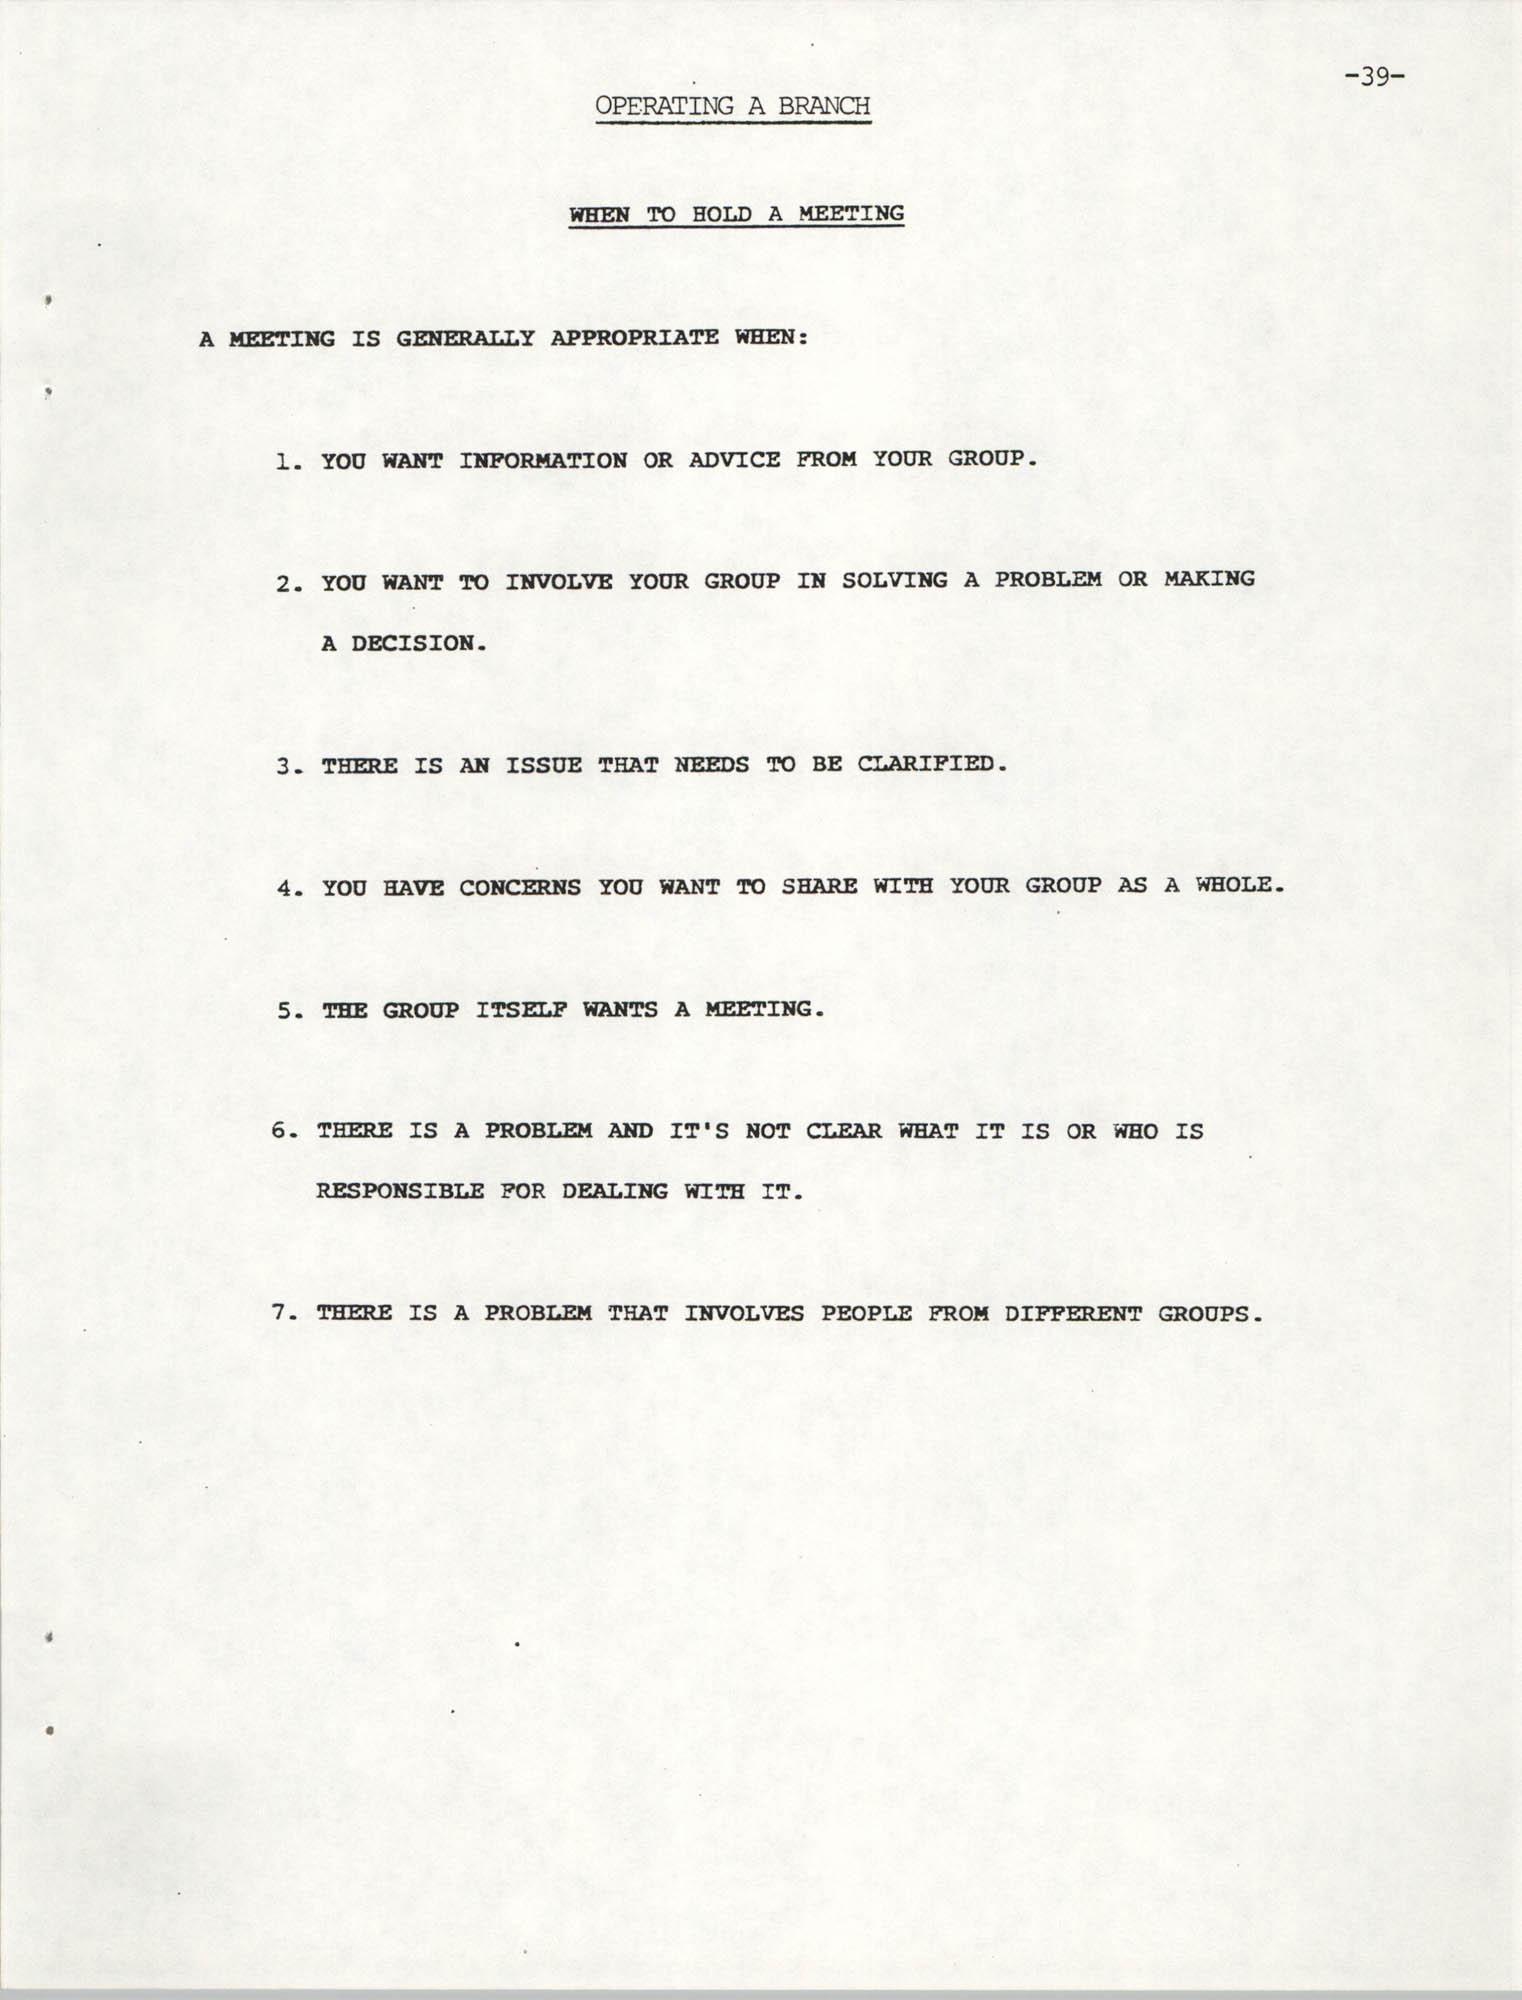 NAACP Mandatory Training Handbook, 1989, Page 39